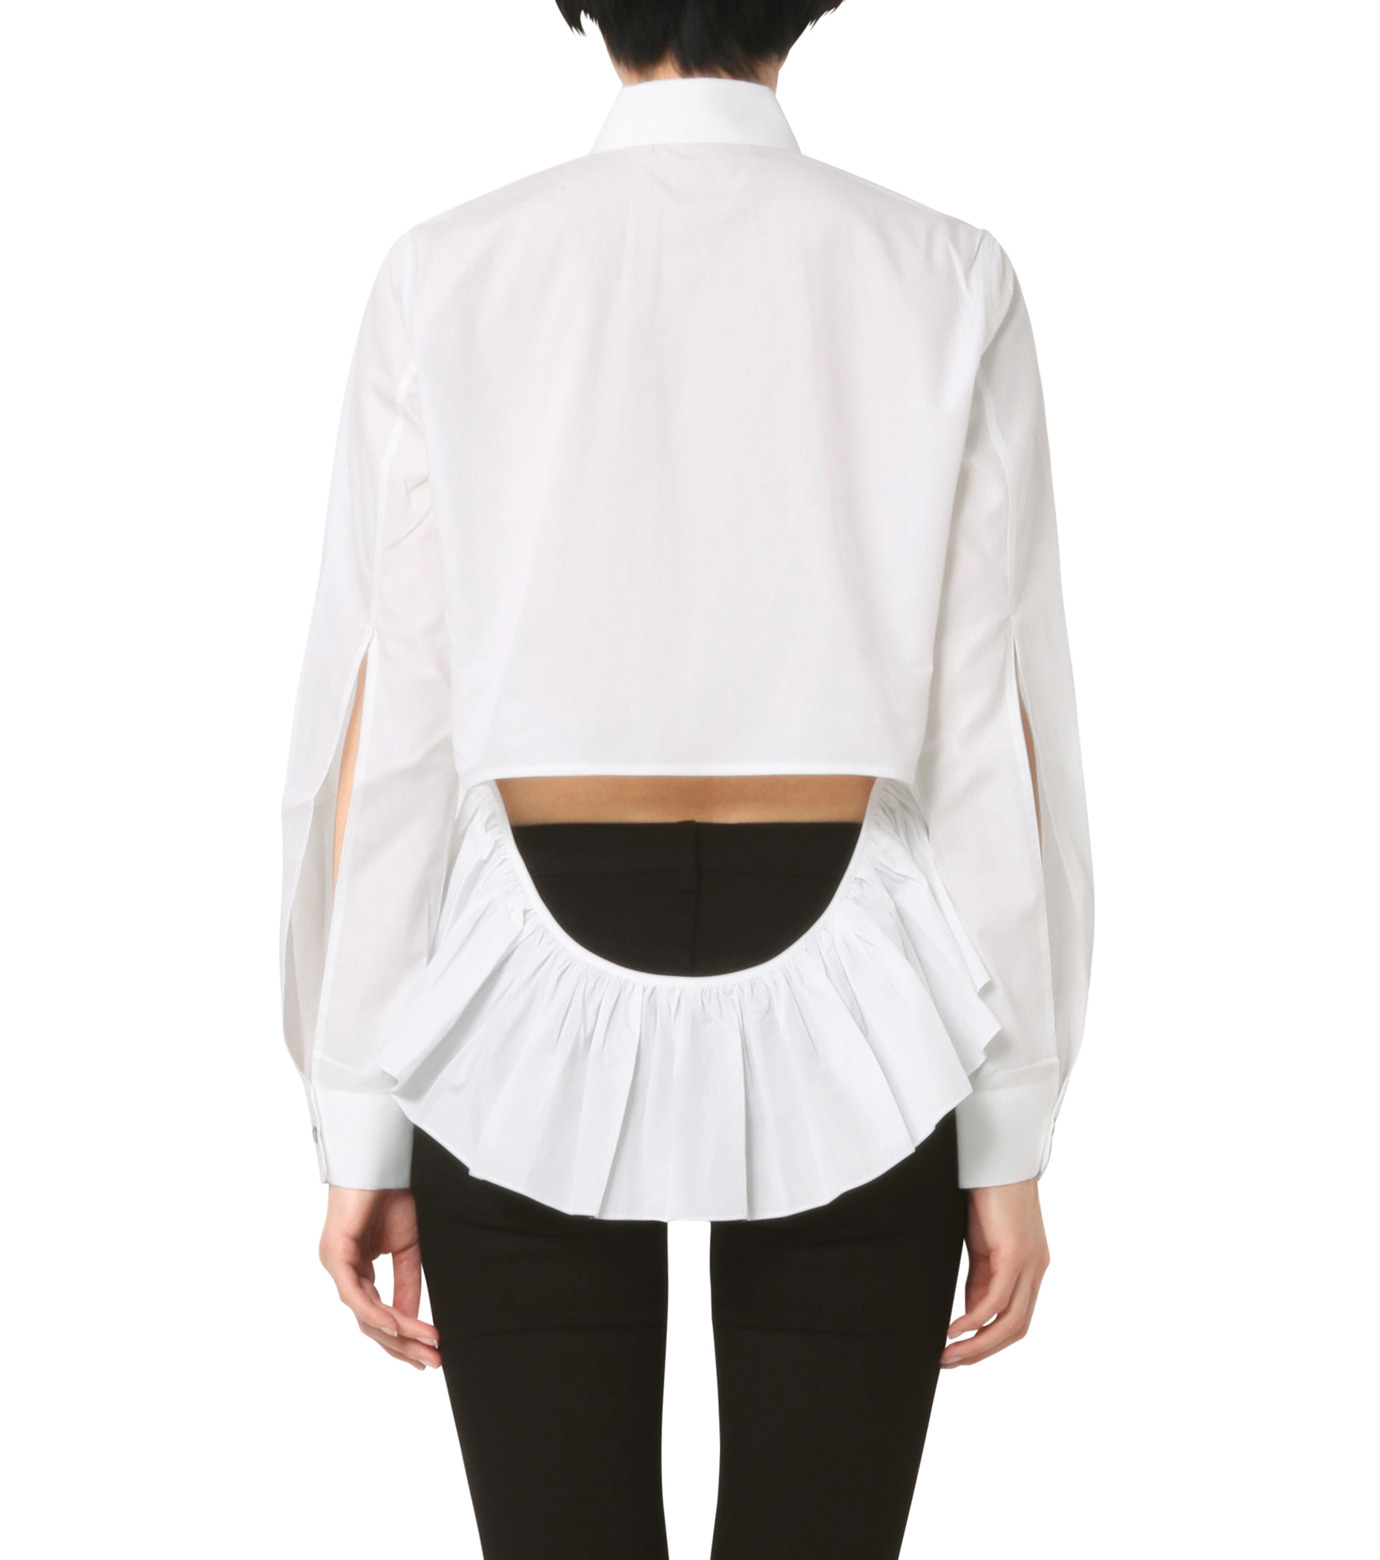 Jourden(ジョーダン)のWhite Shirt w/Ruffle Back Slit-WHITE(シャツ/shirt)-1603WC1TH01-4 拡大詳細画像2